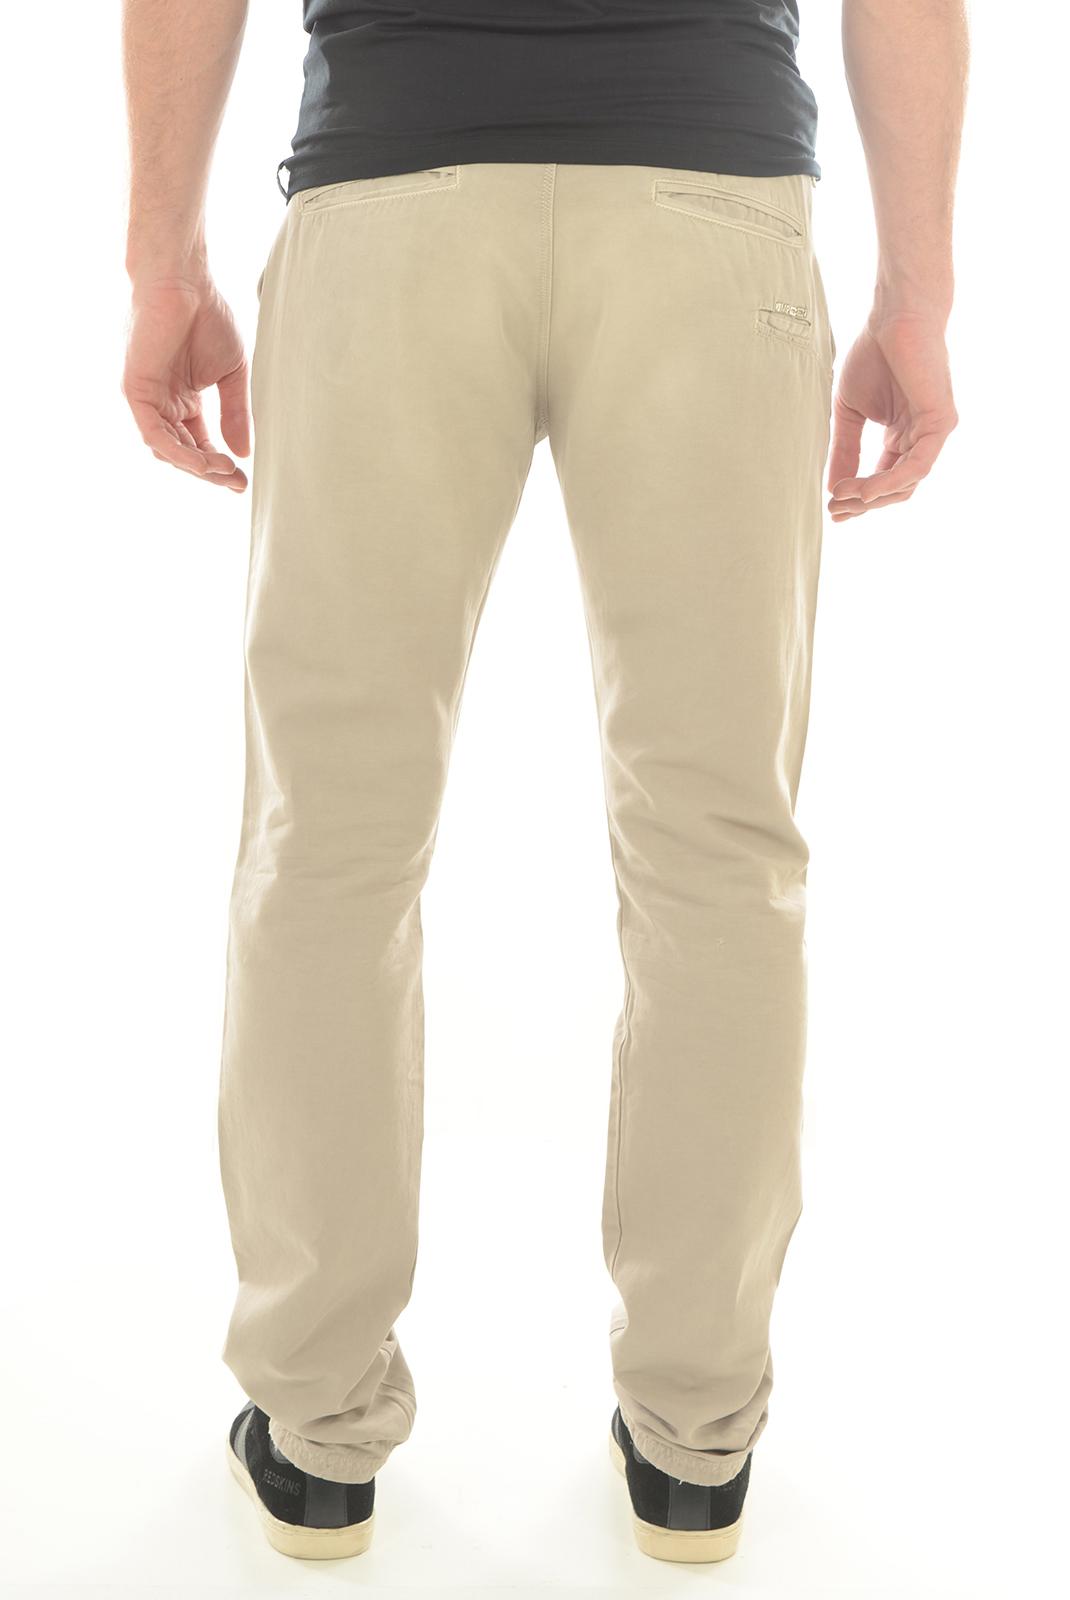 Pantalons chino/citadin  Meltin'pot MP006 G2022 GE000 BEIGE